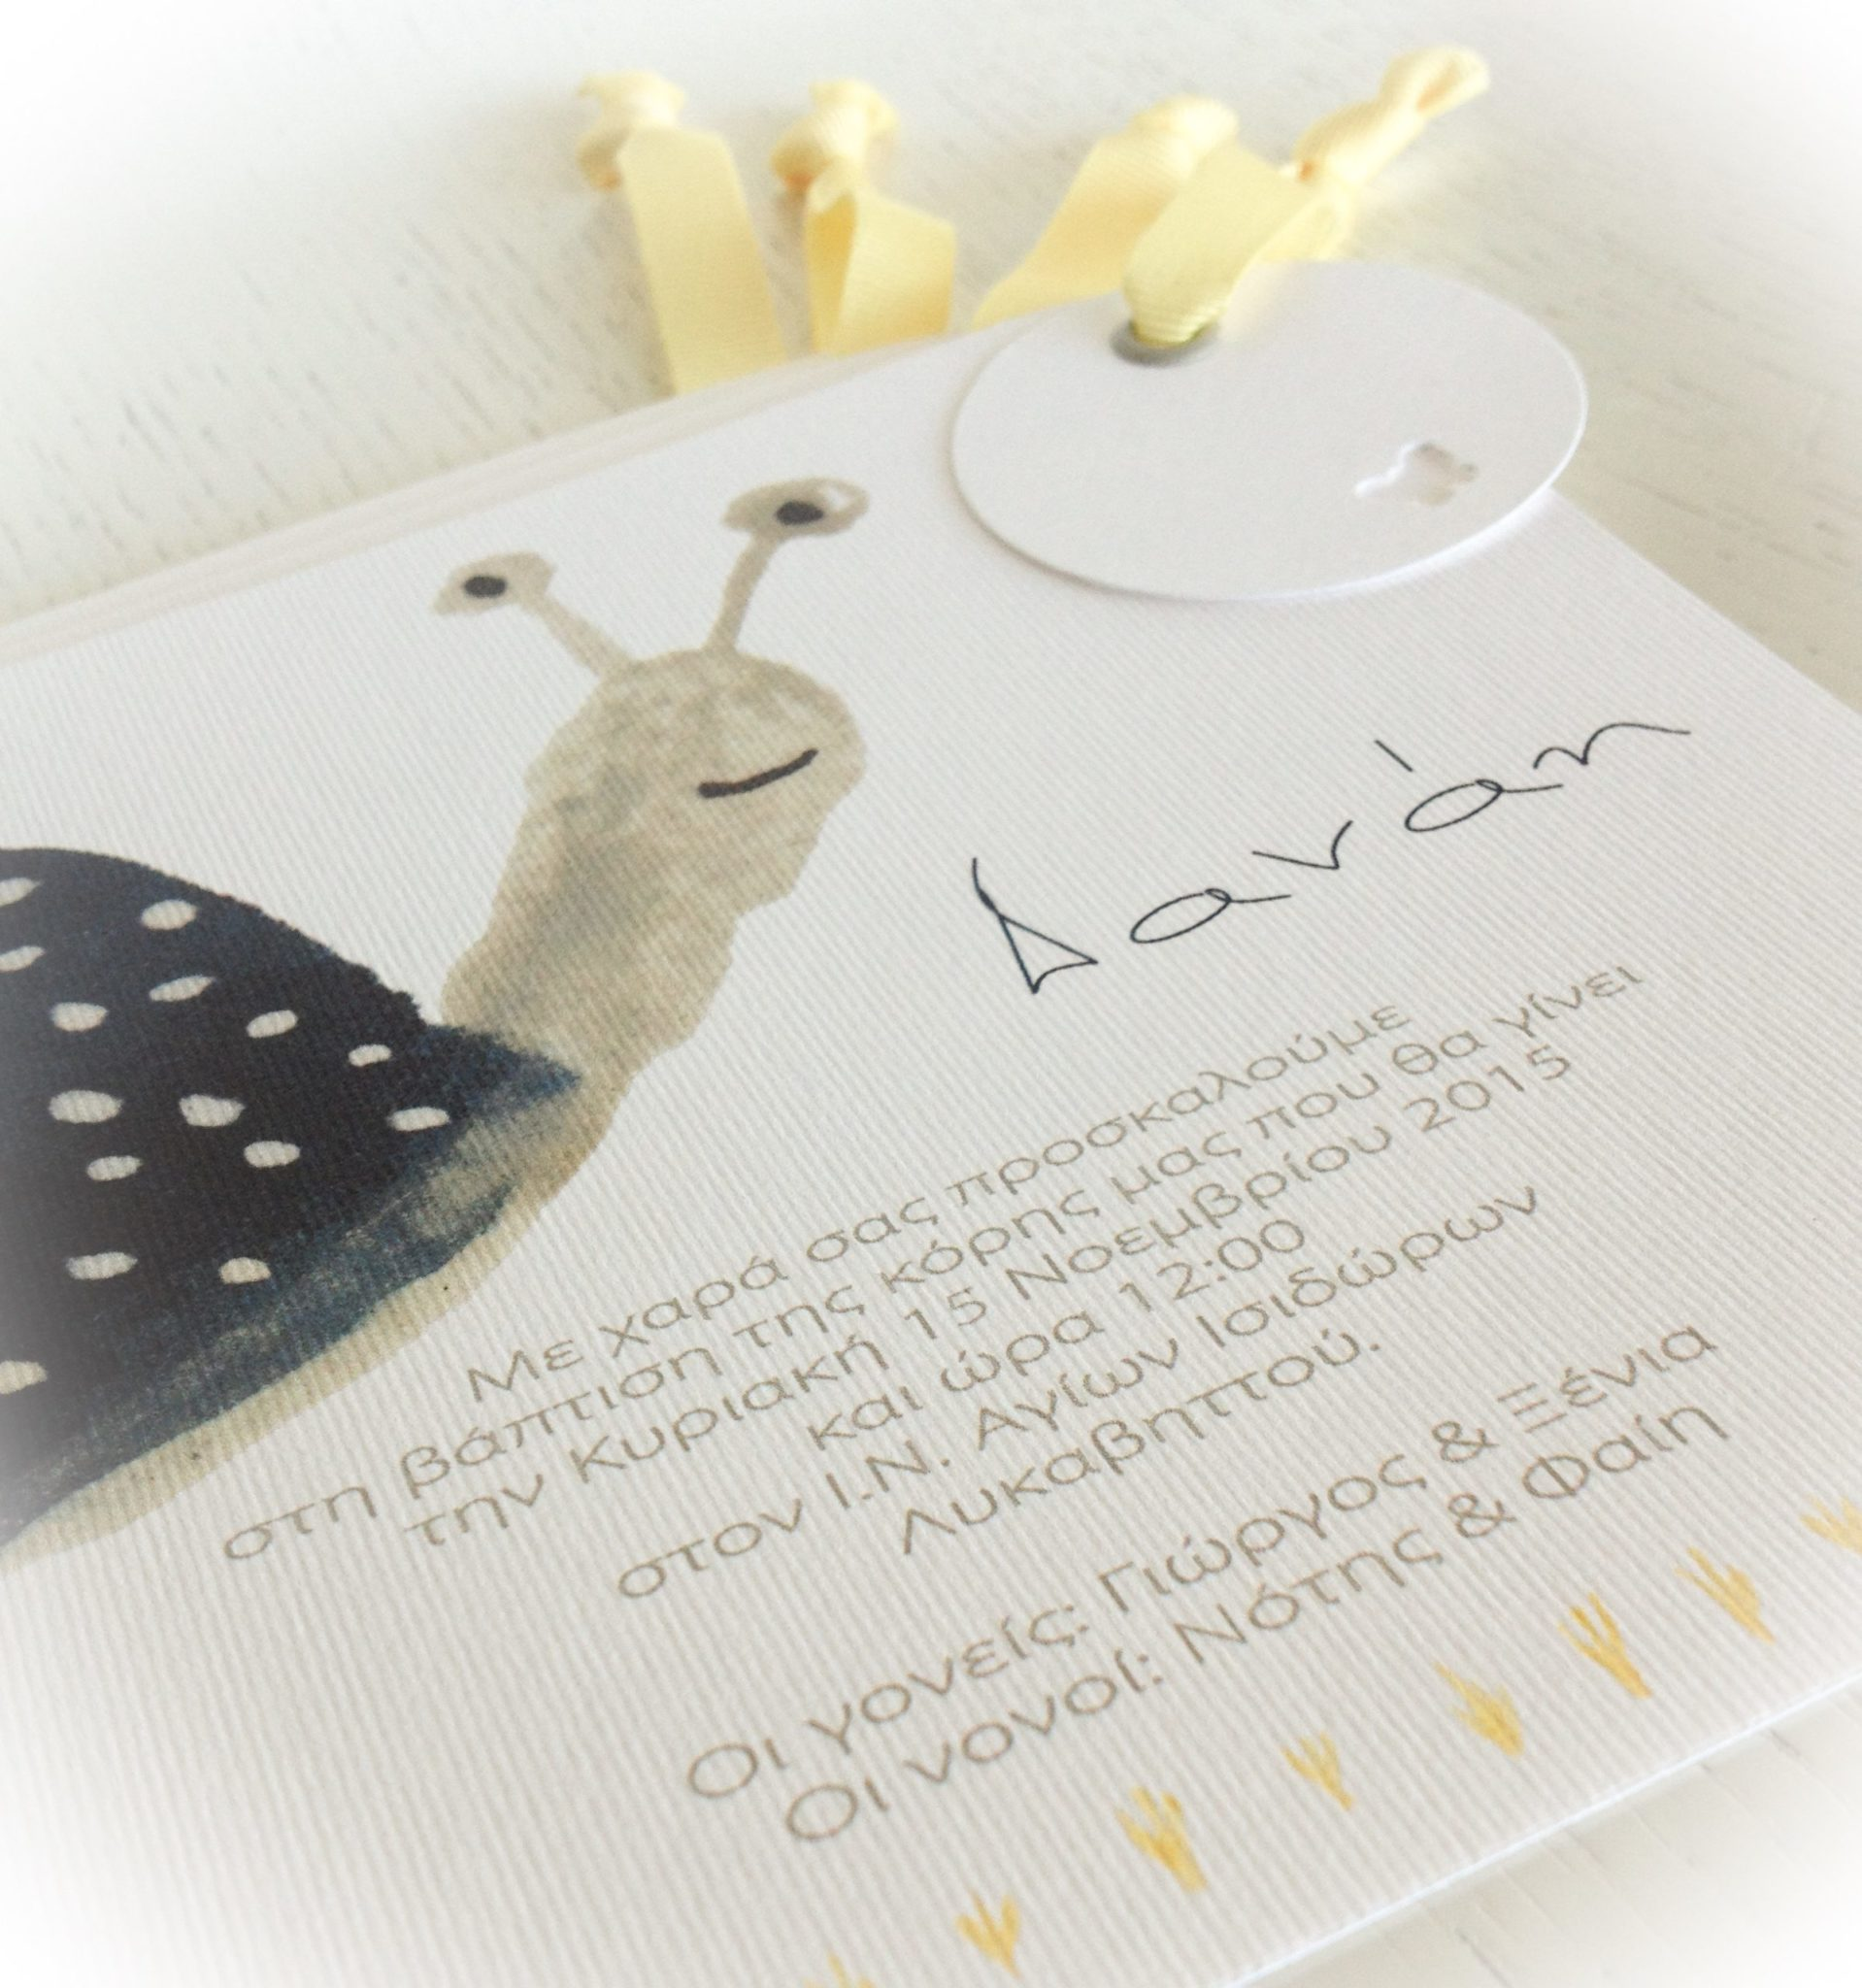 Snails And Butterflies-baptism invitation-closeup